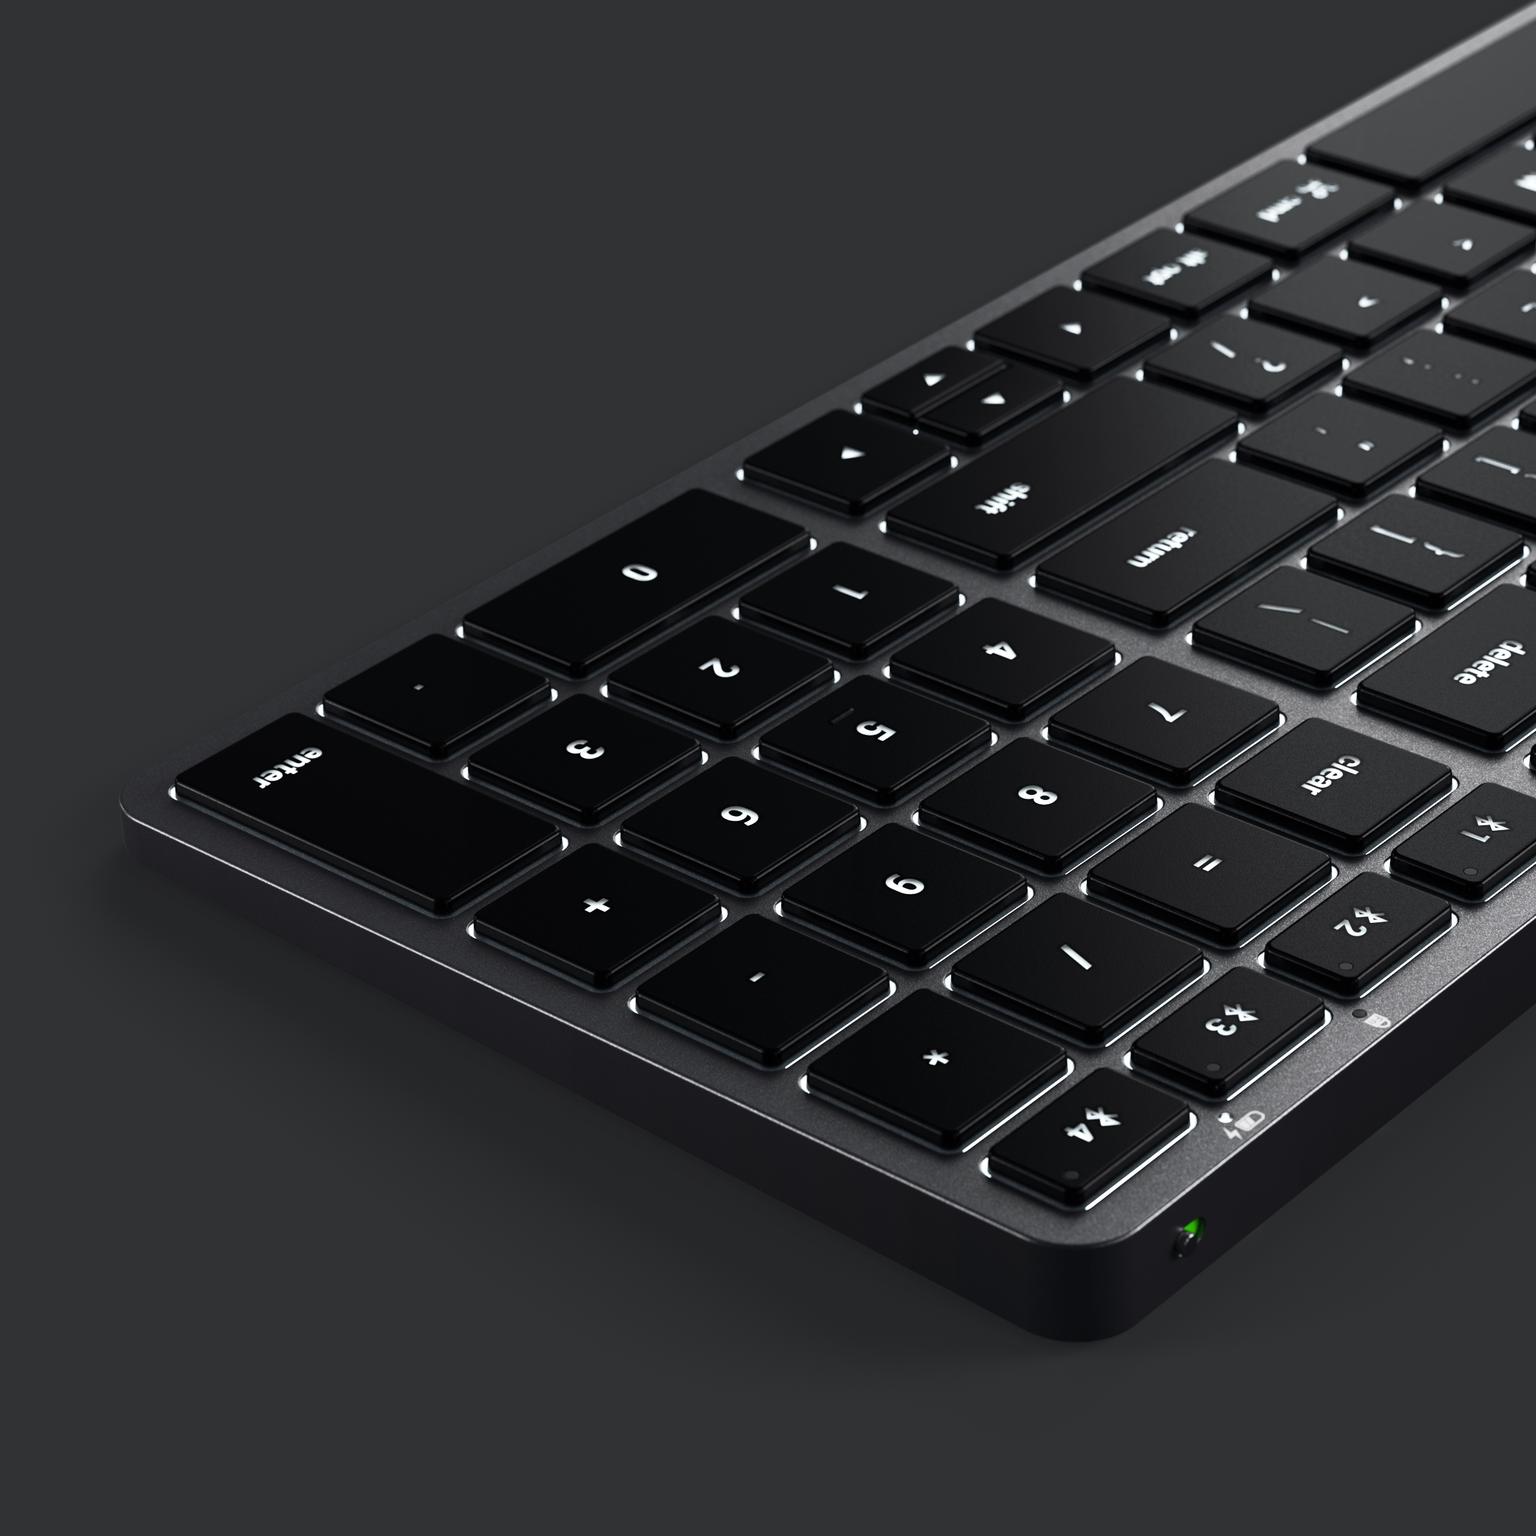 Satechi Slim X2 Keyboard